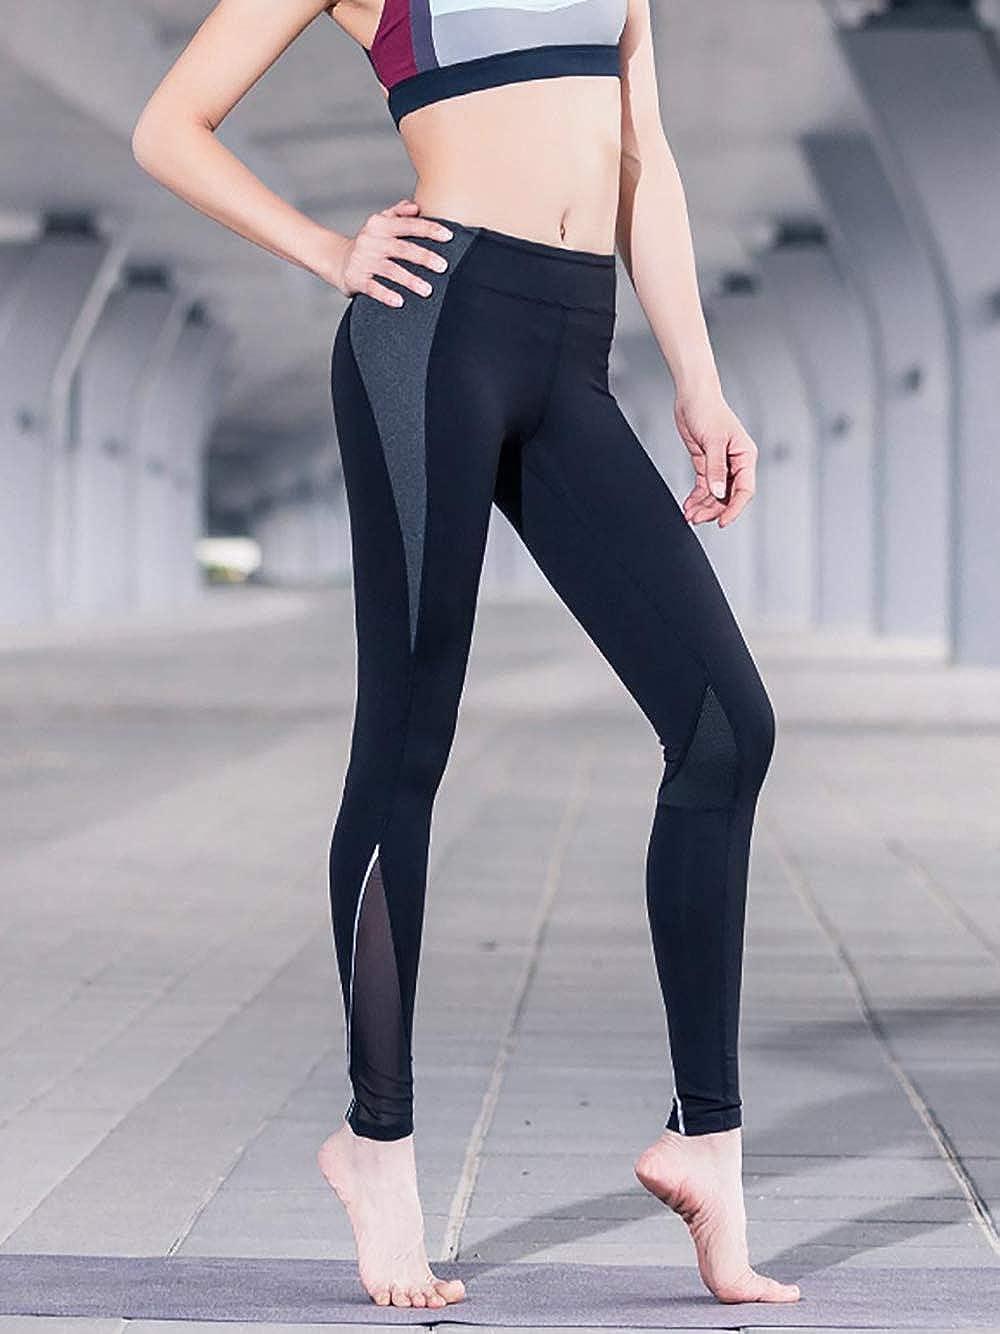 73c0401070 Zenwow Women s Sports Leggings High Waist Yoga Pants Gym Workout Running  Tights Back Zipper Pocket  Amazon.co.uk  Clothing